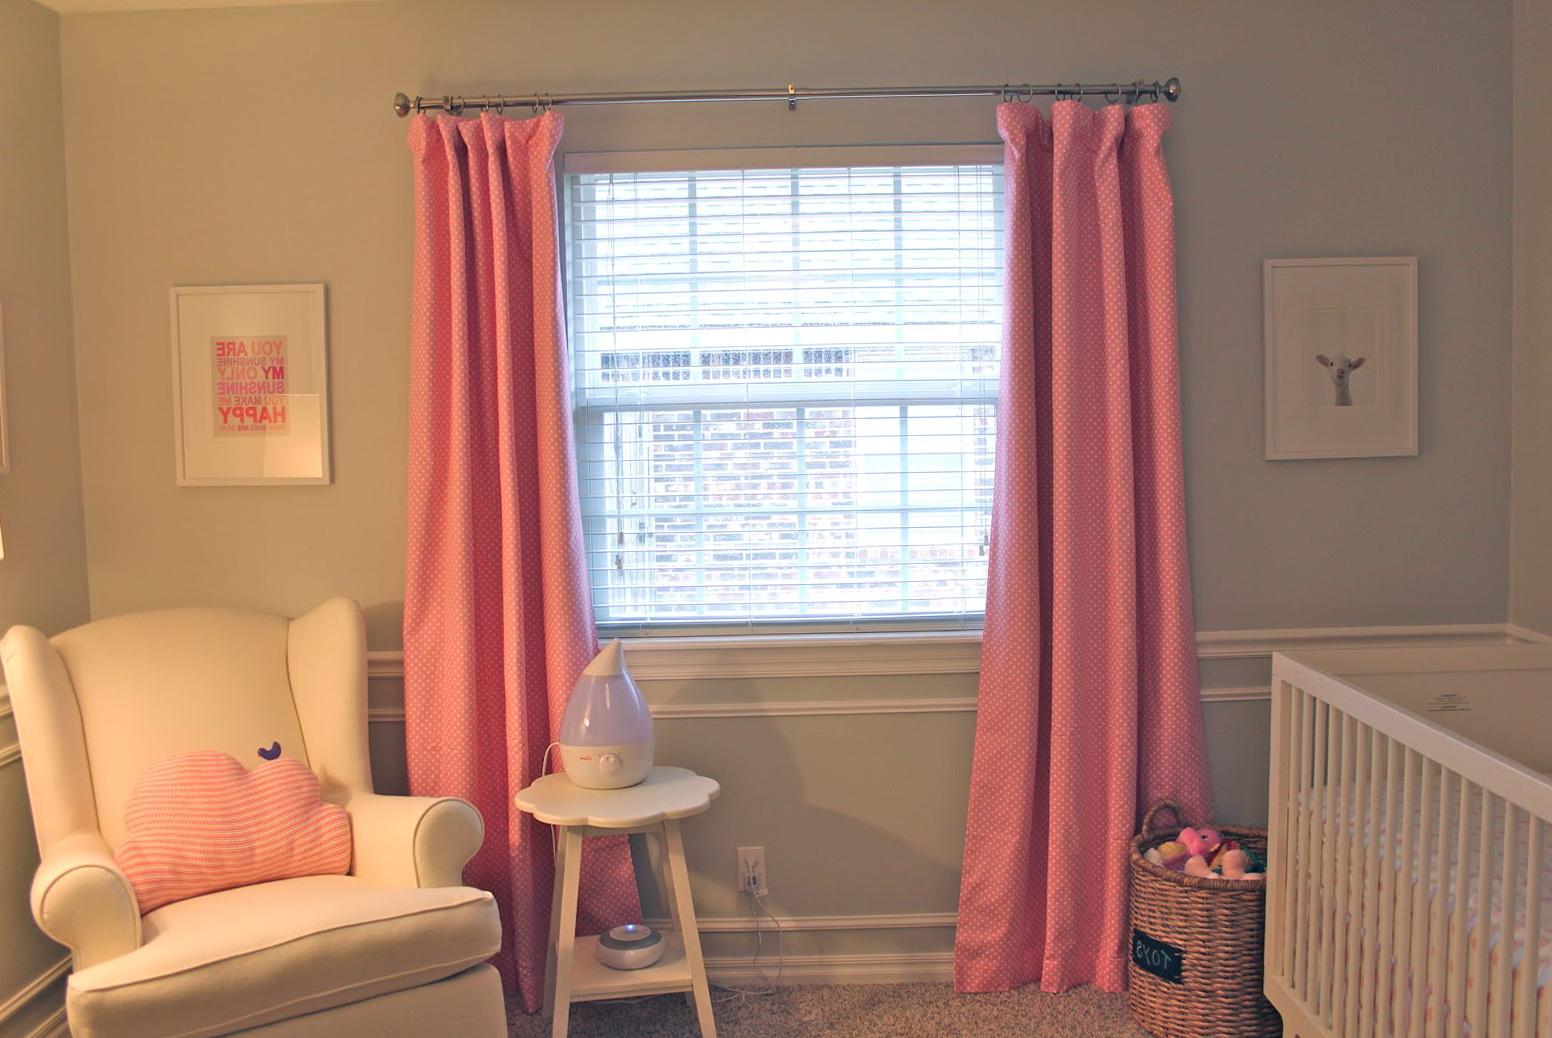 Nursery Blackout Curtains Target Home Design Ideas